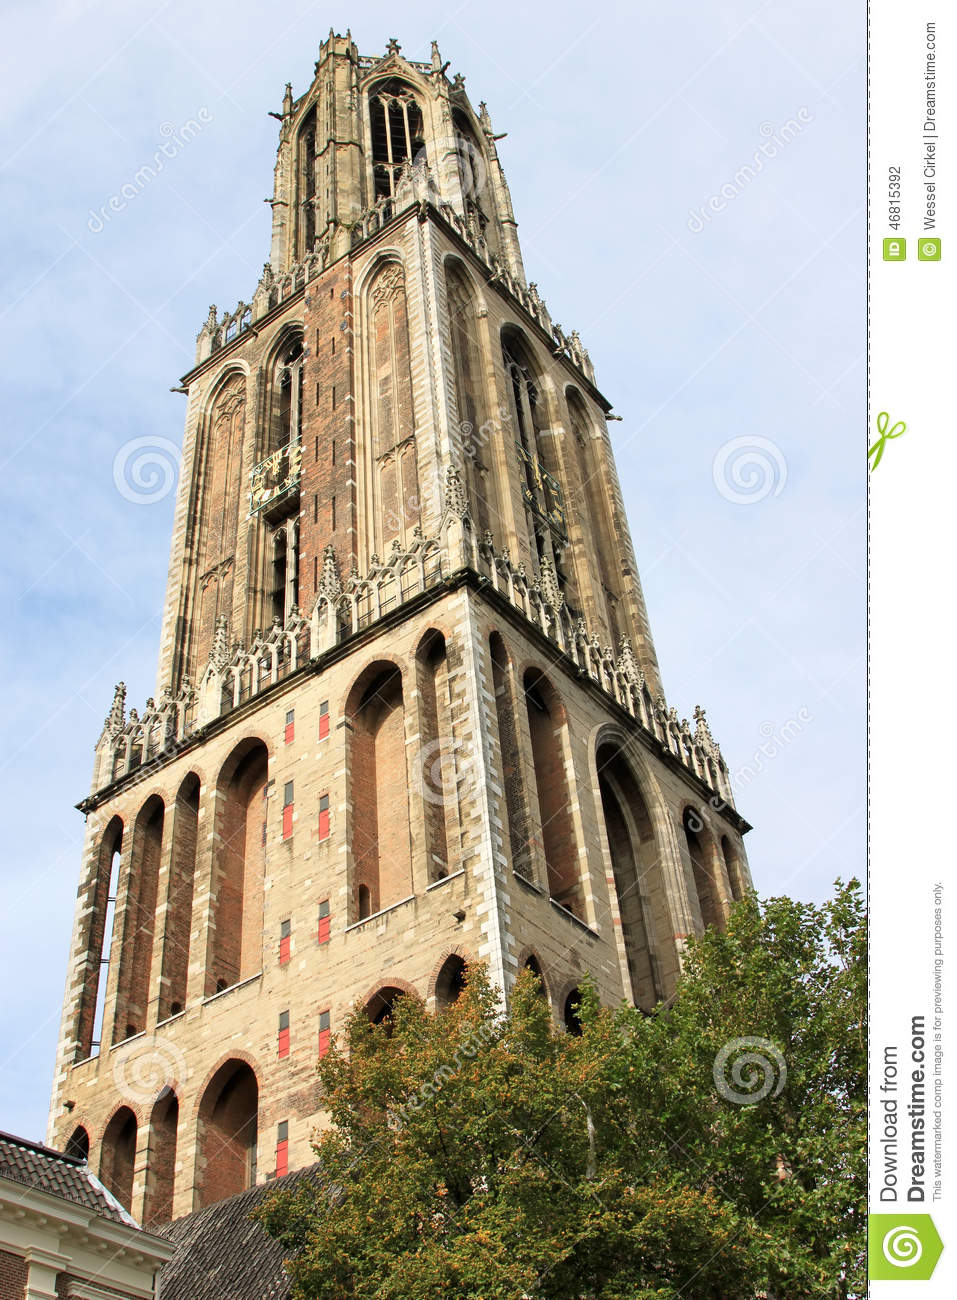 Gothic Dom Tower Of Utrecht, Netherlands Stock Photo.